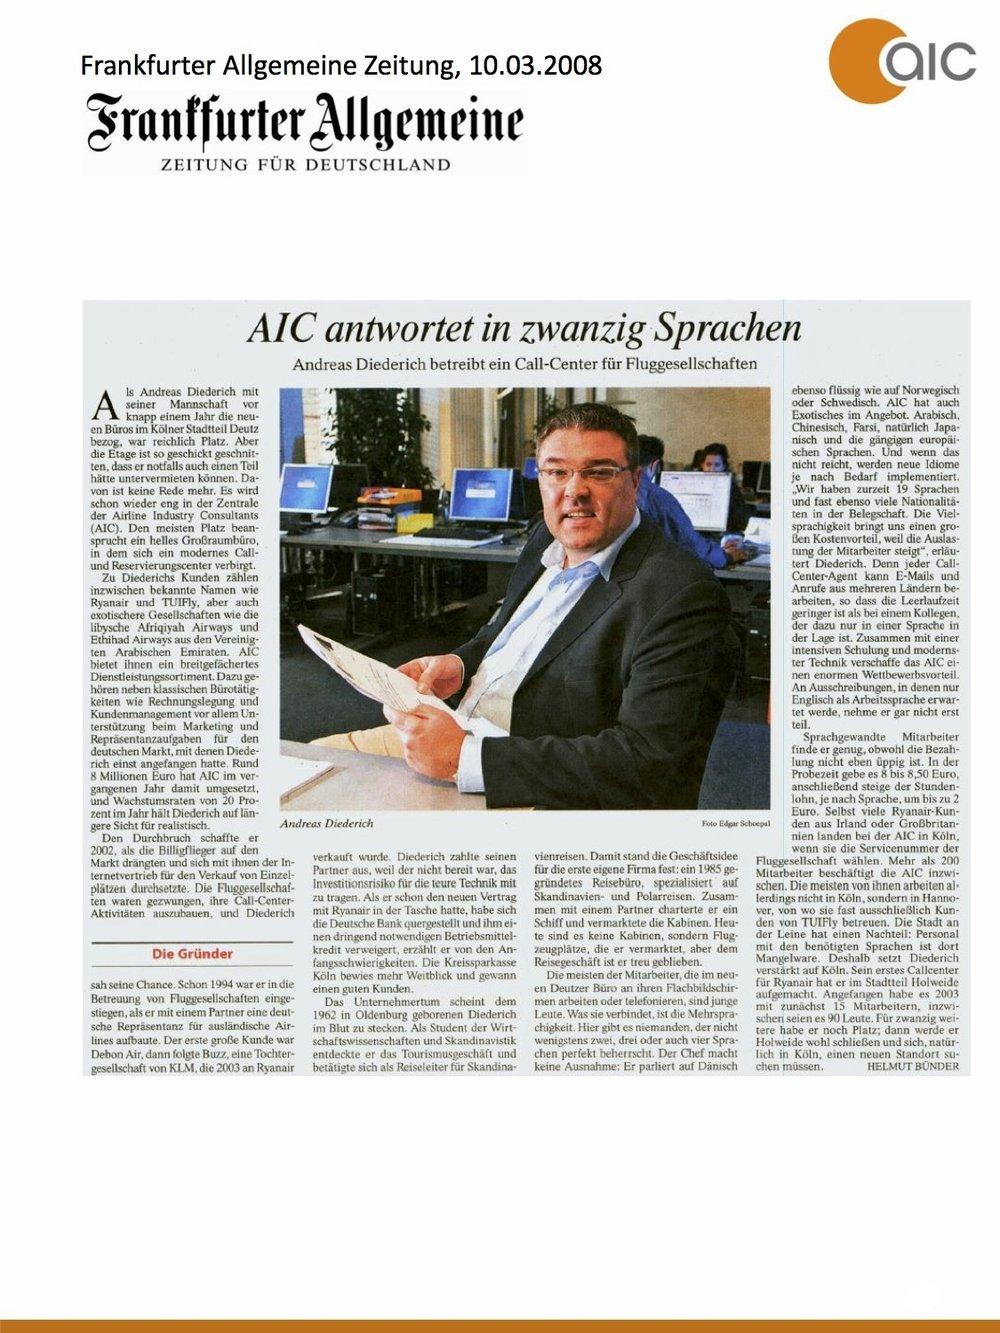 aic pressespiegel 36.jpg